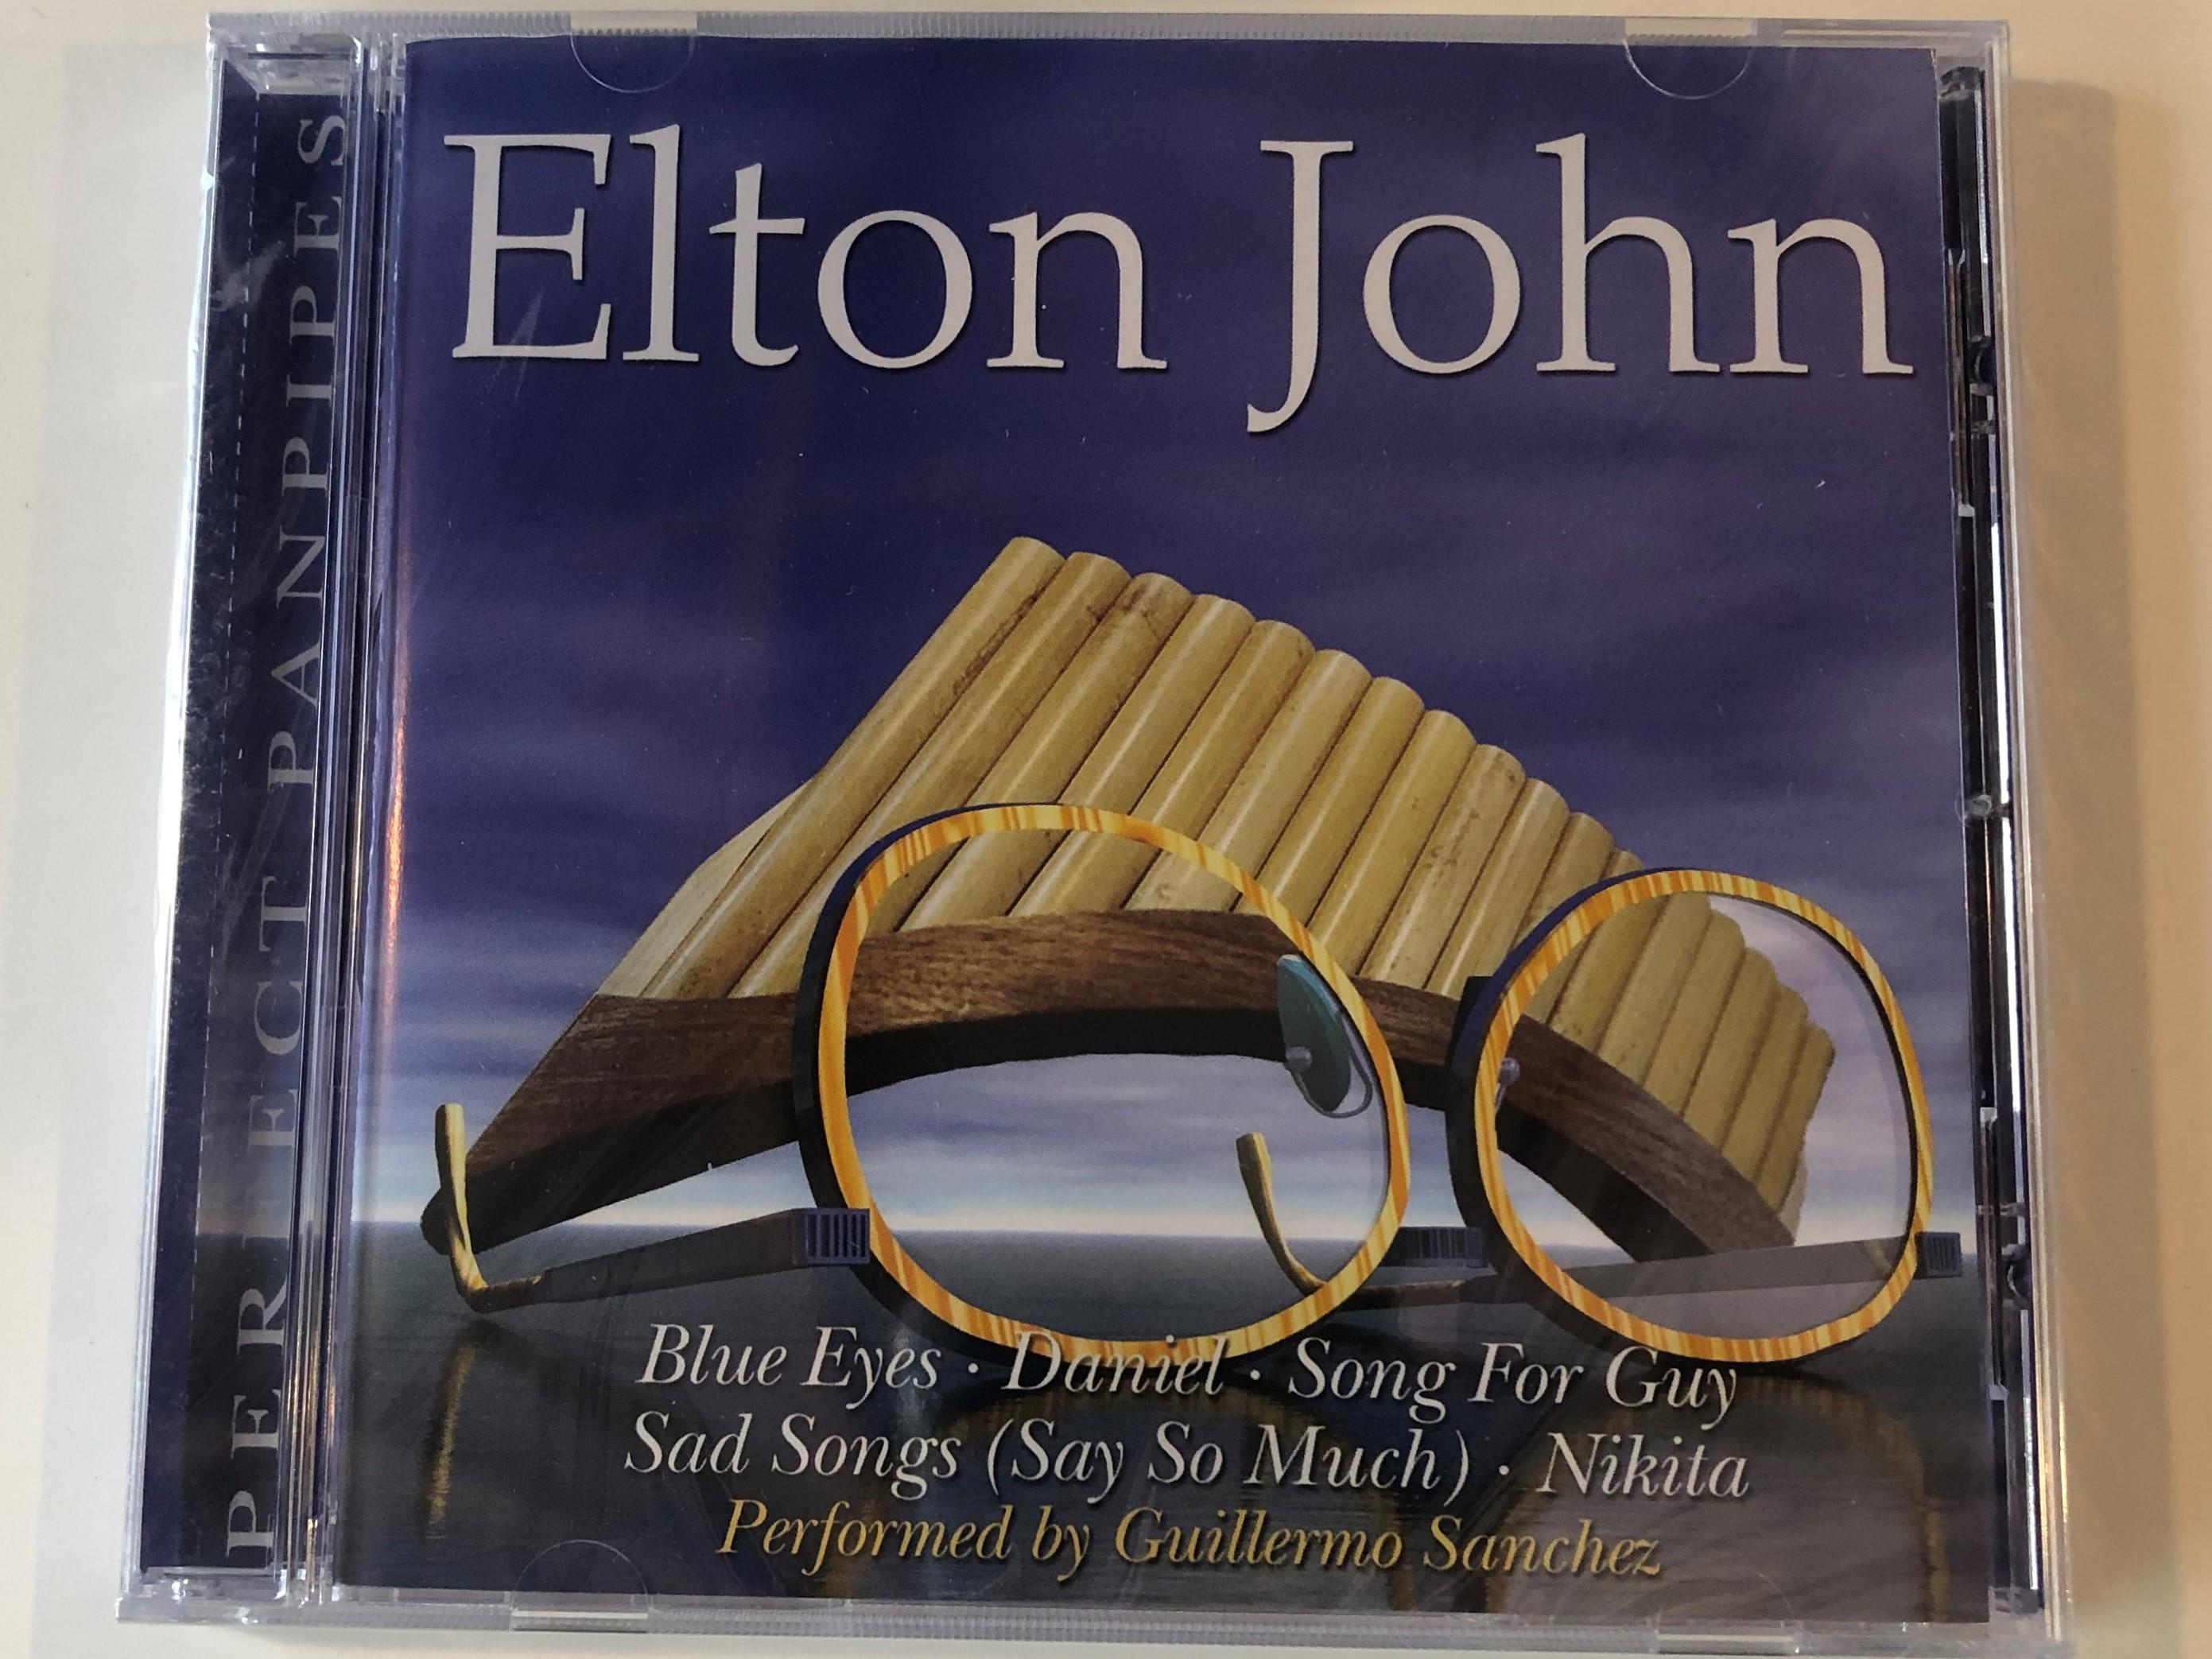 elton-john-blue-eyes-daniel-song-for-guy-sad-songs-say-so-much-nikita-performed-by-gullermo-sanchez-perfect-panpipes-audio-cd-2001-3112-2-1-.jpg